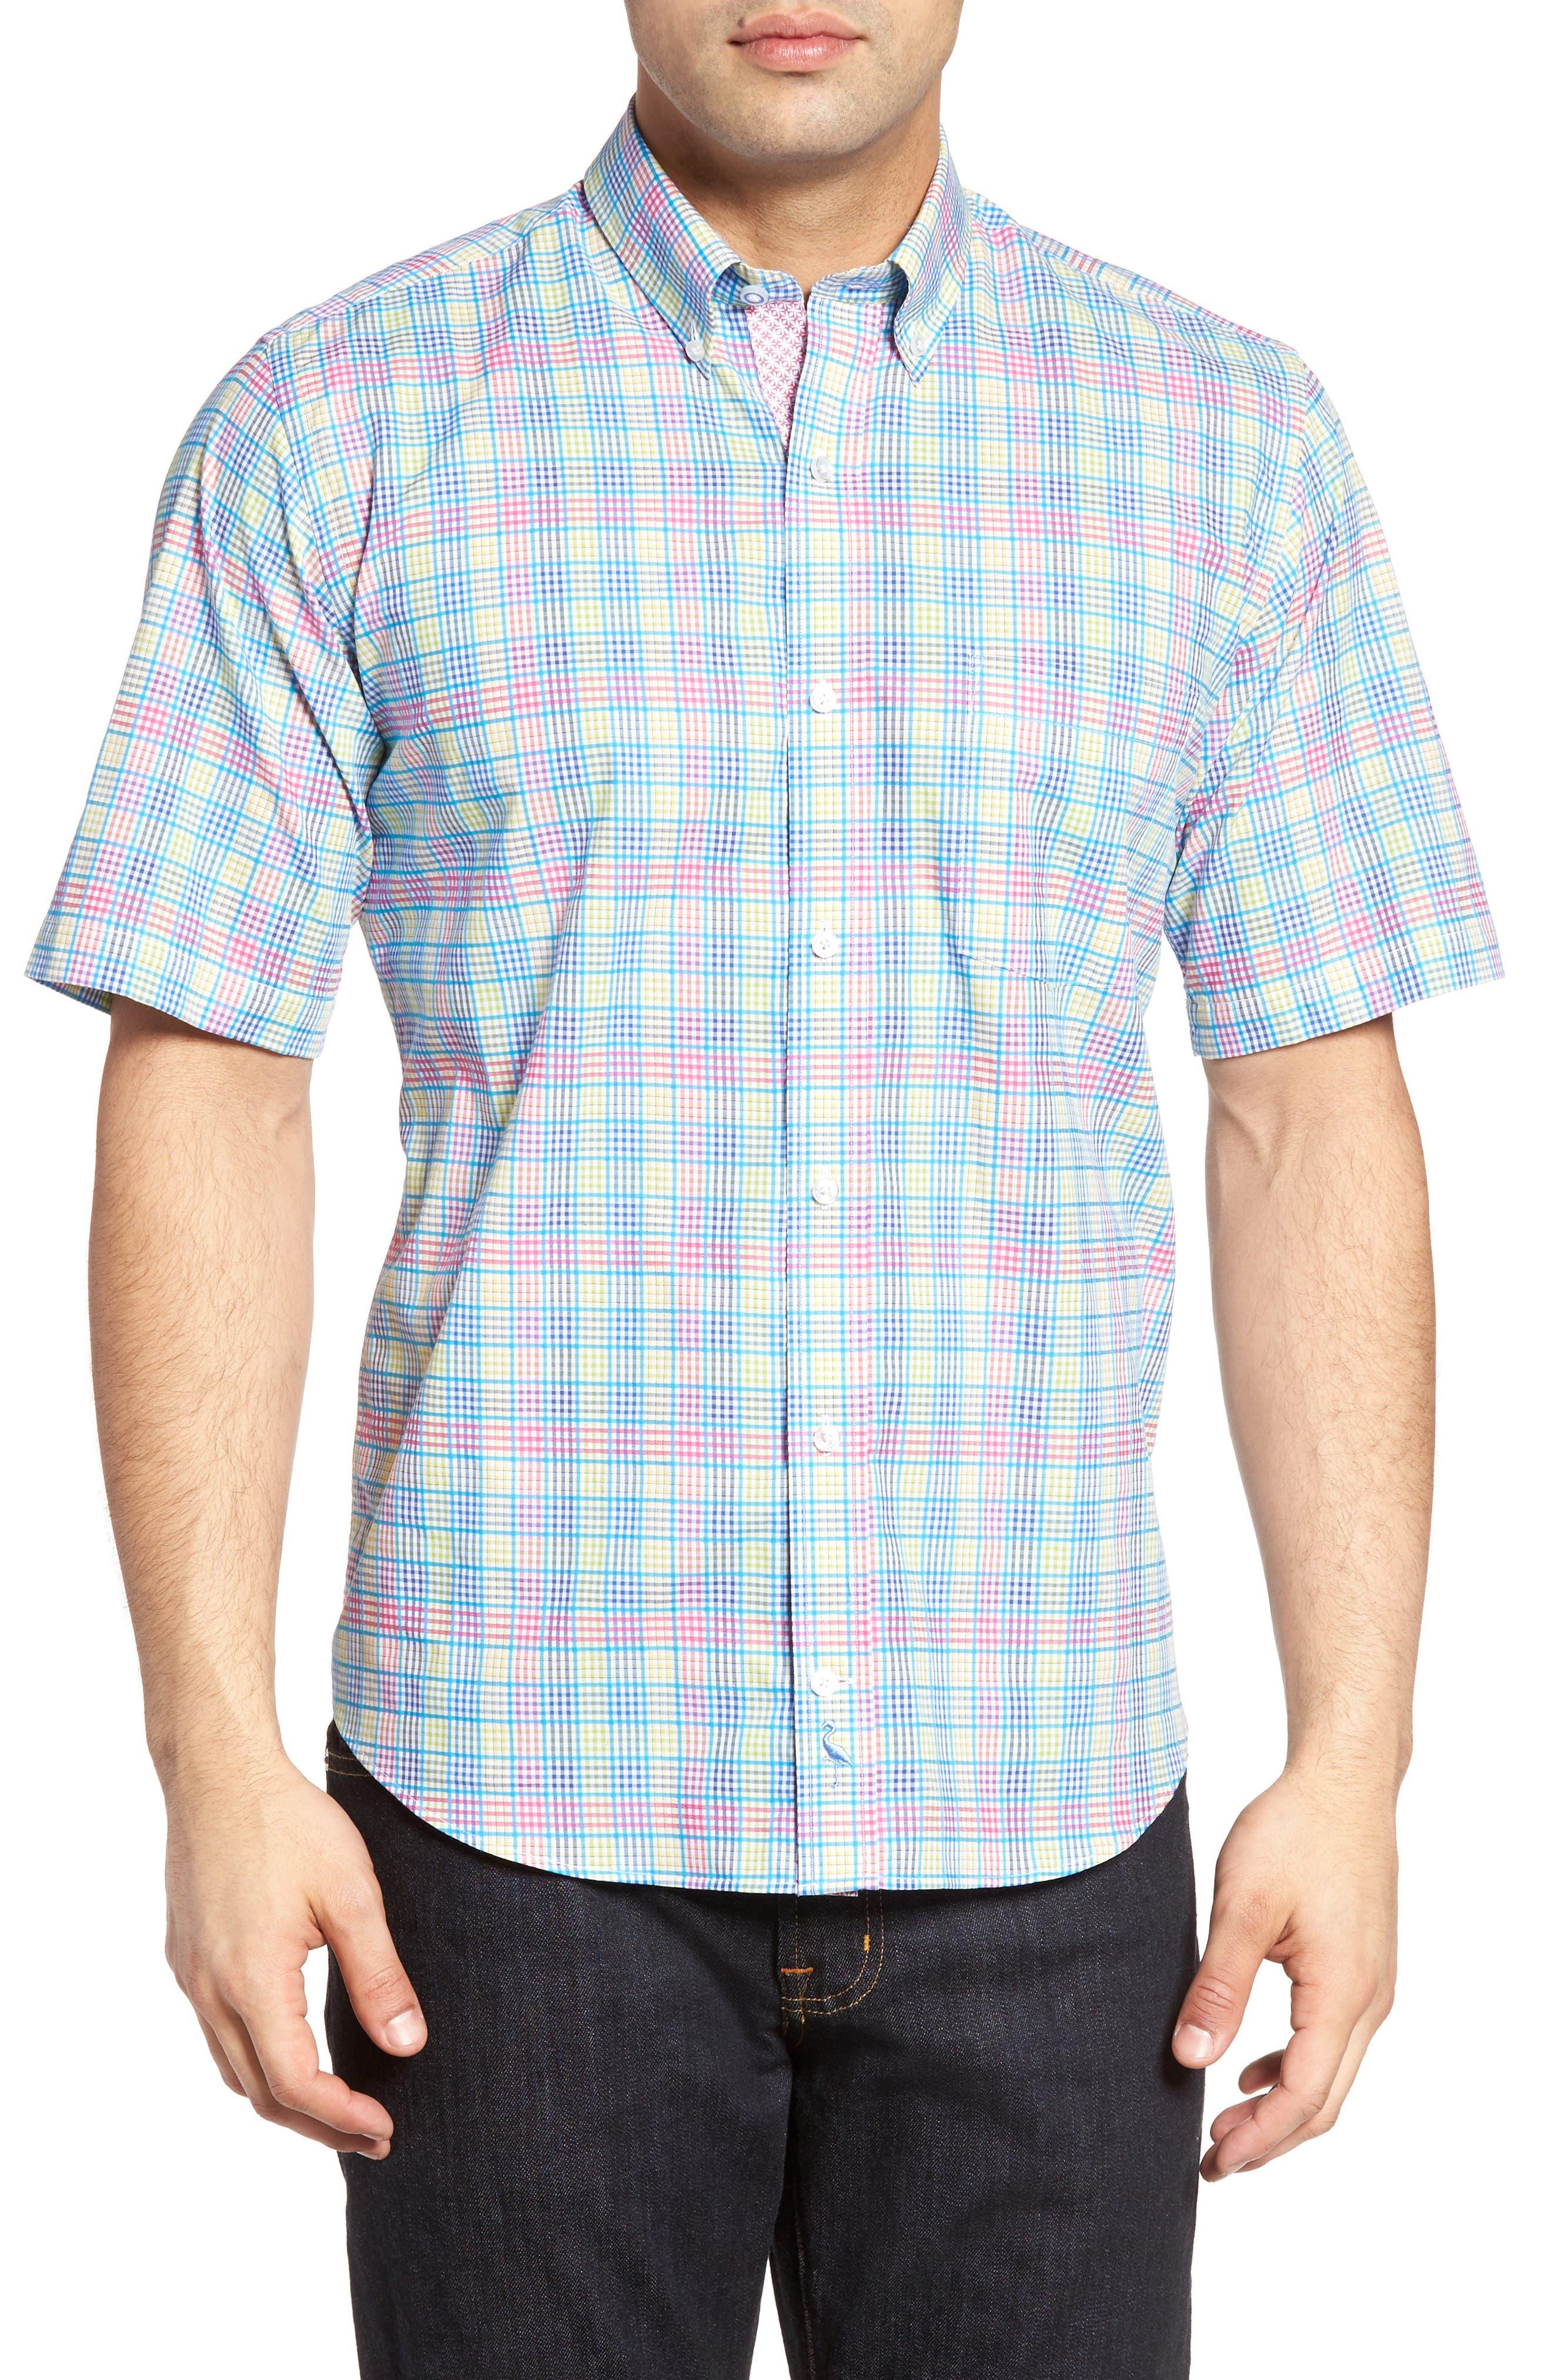 Lemon Plaid Sport Shirt,                             Main thumbnail 1, color,                             Blue/ Lime